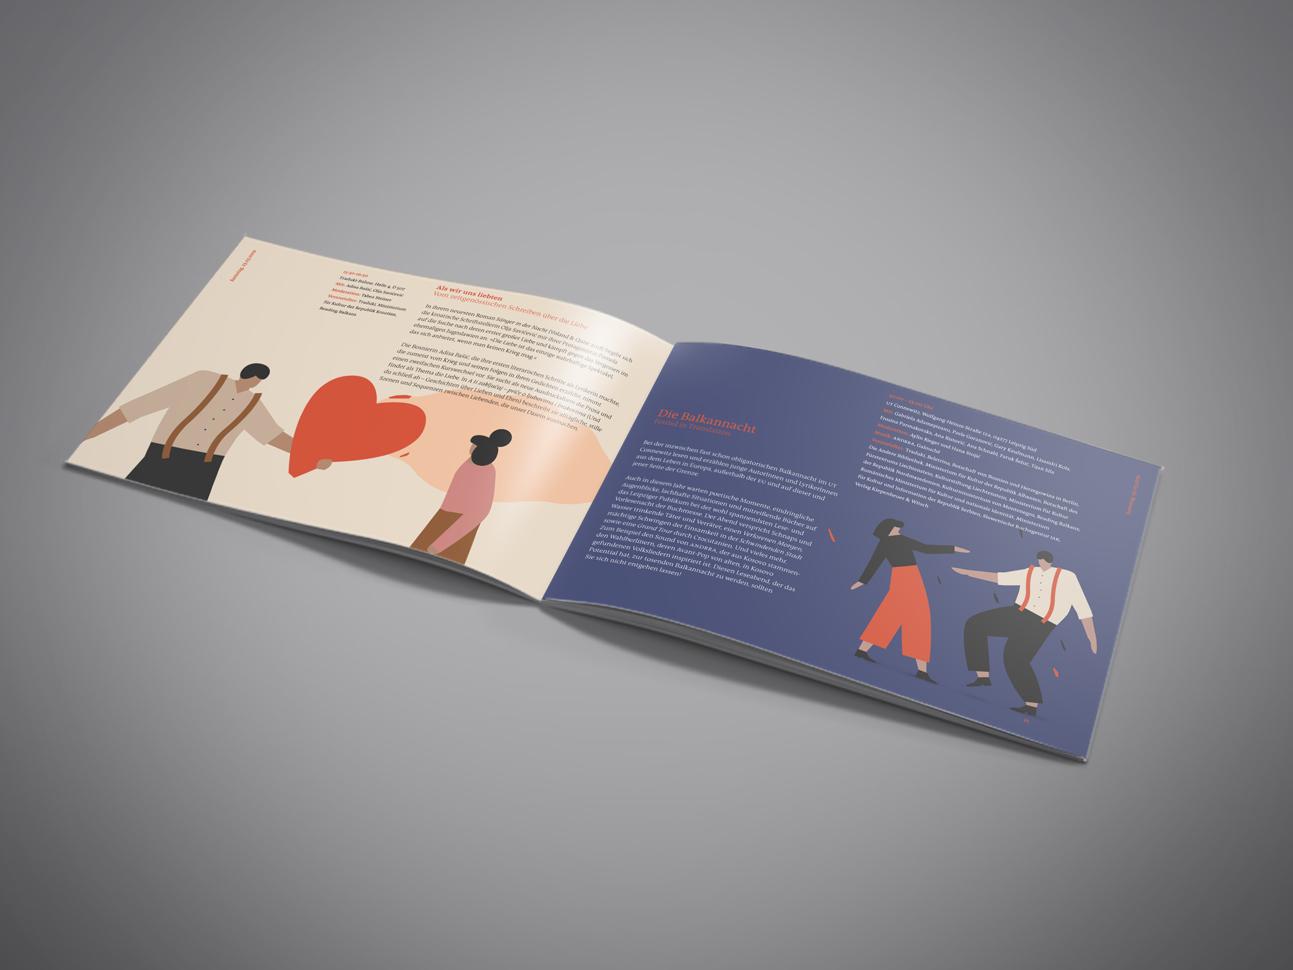 martin zech design, projekt design, traduki, messestand, leipziger buchmesse, 2019, programmheft, doppelseite 2